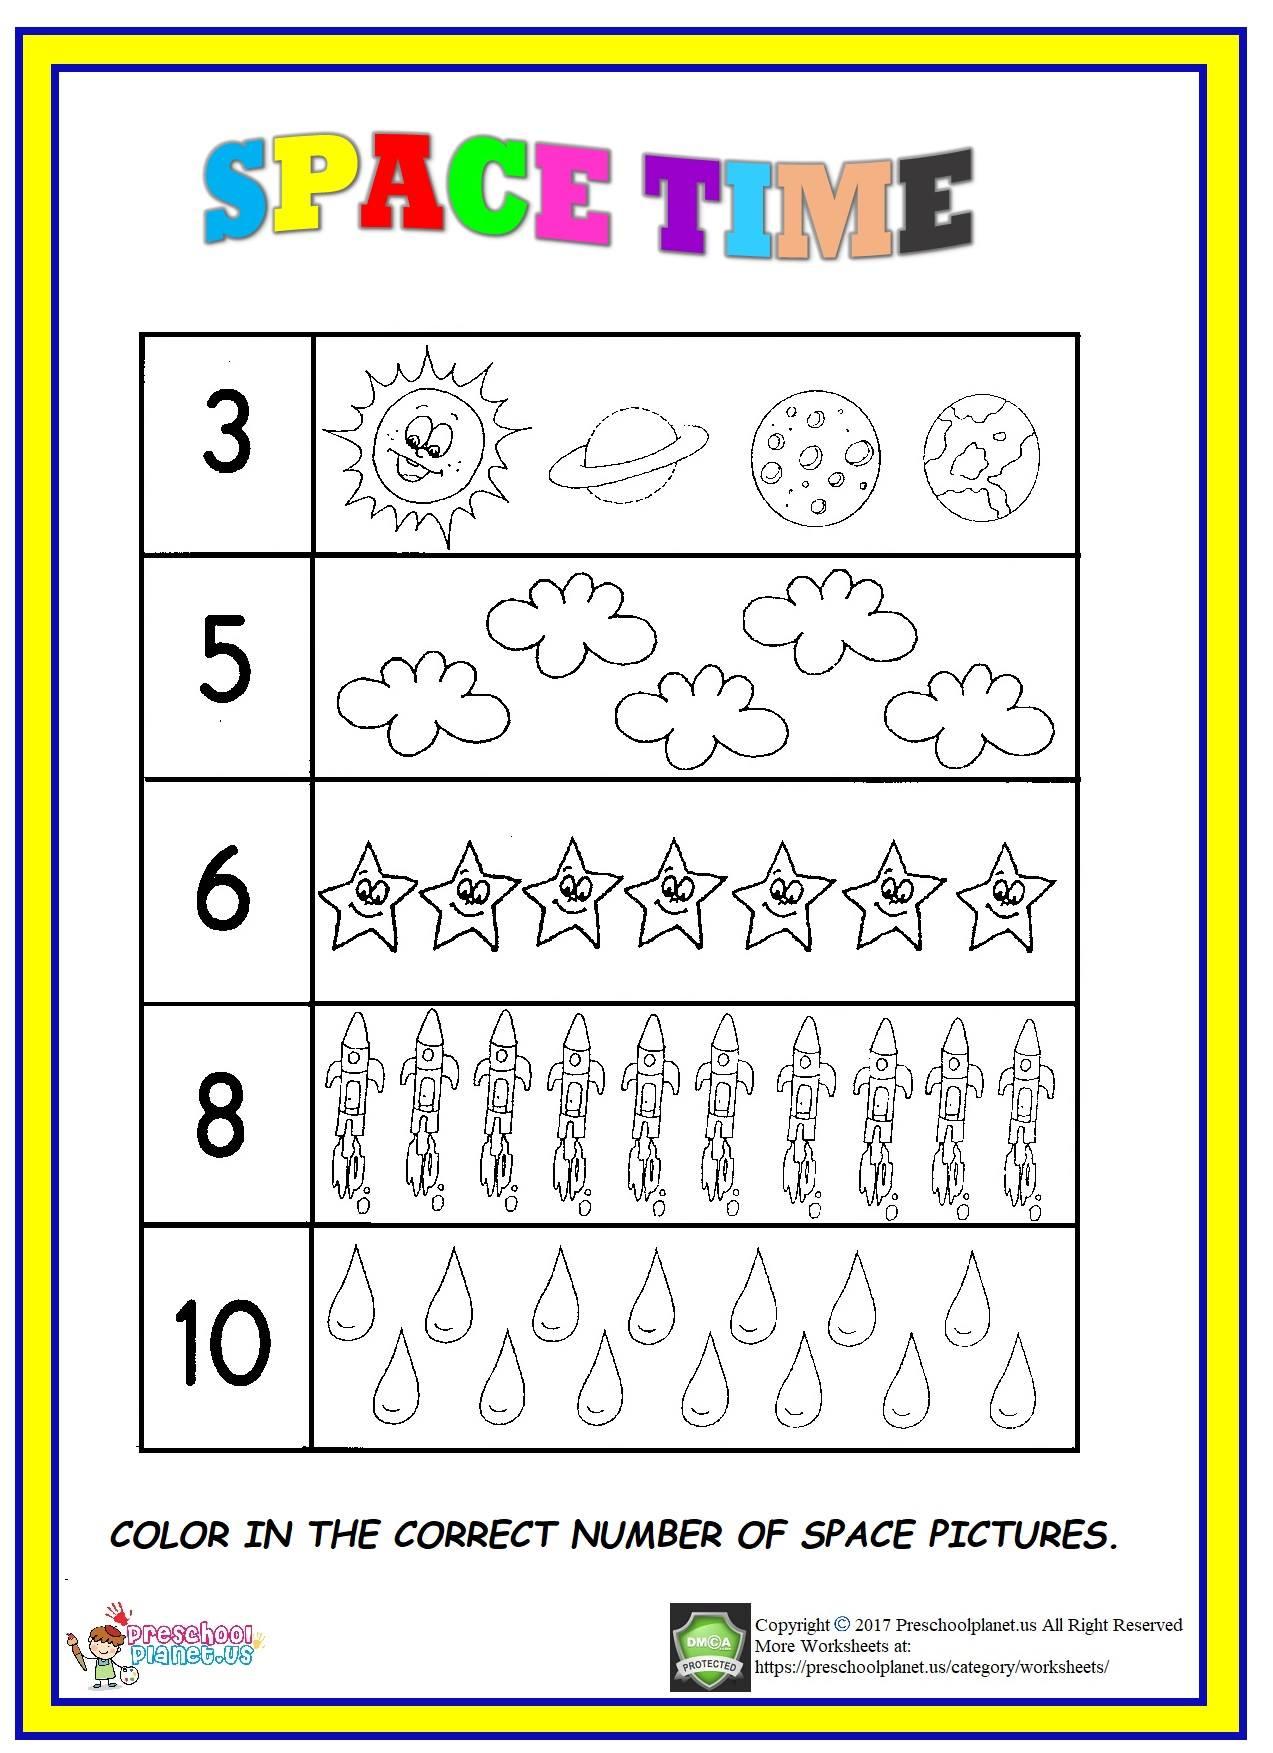 Shapes Worksheet Preschoolplanet